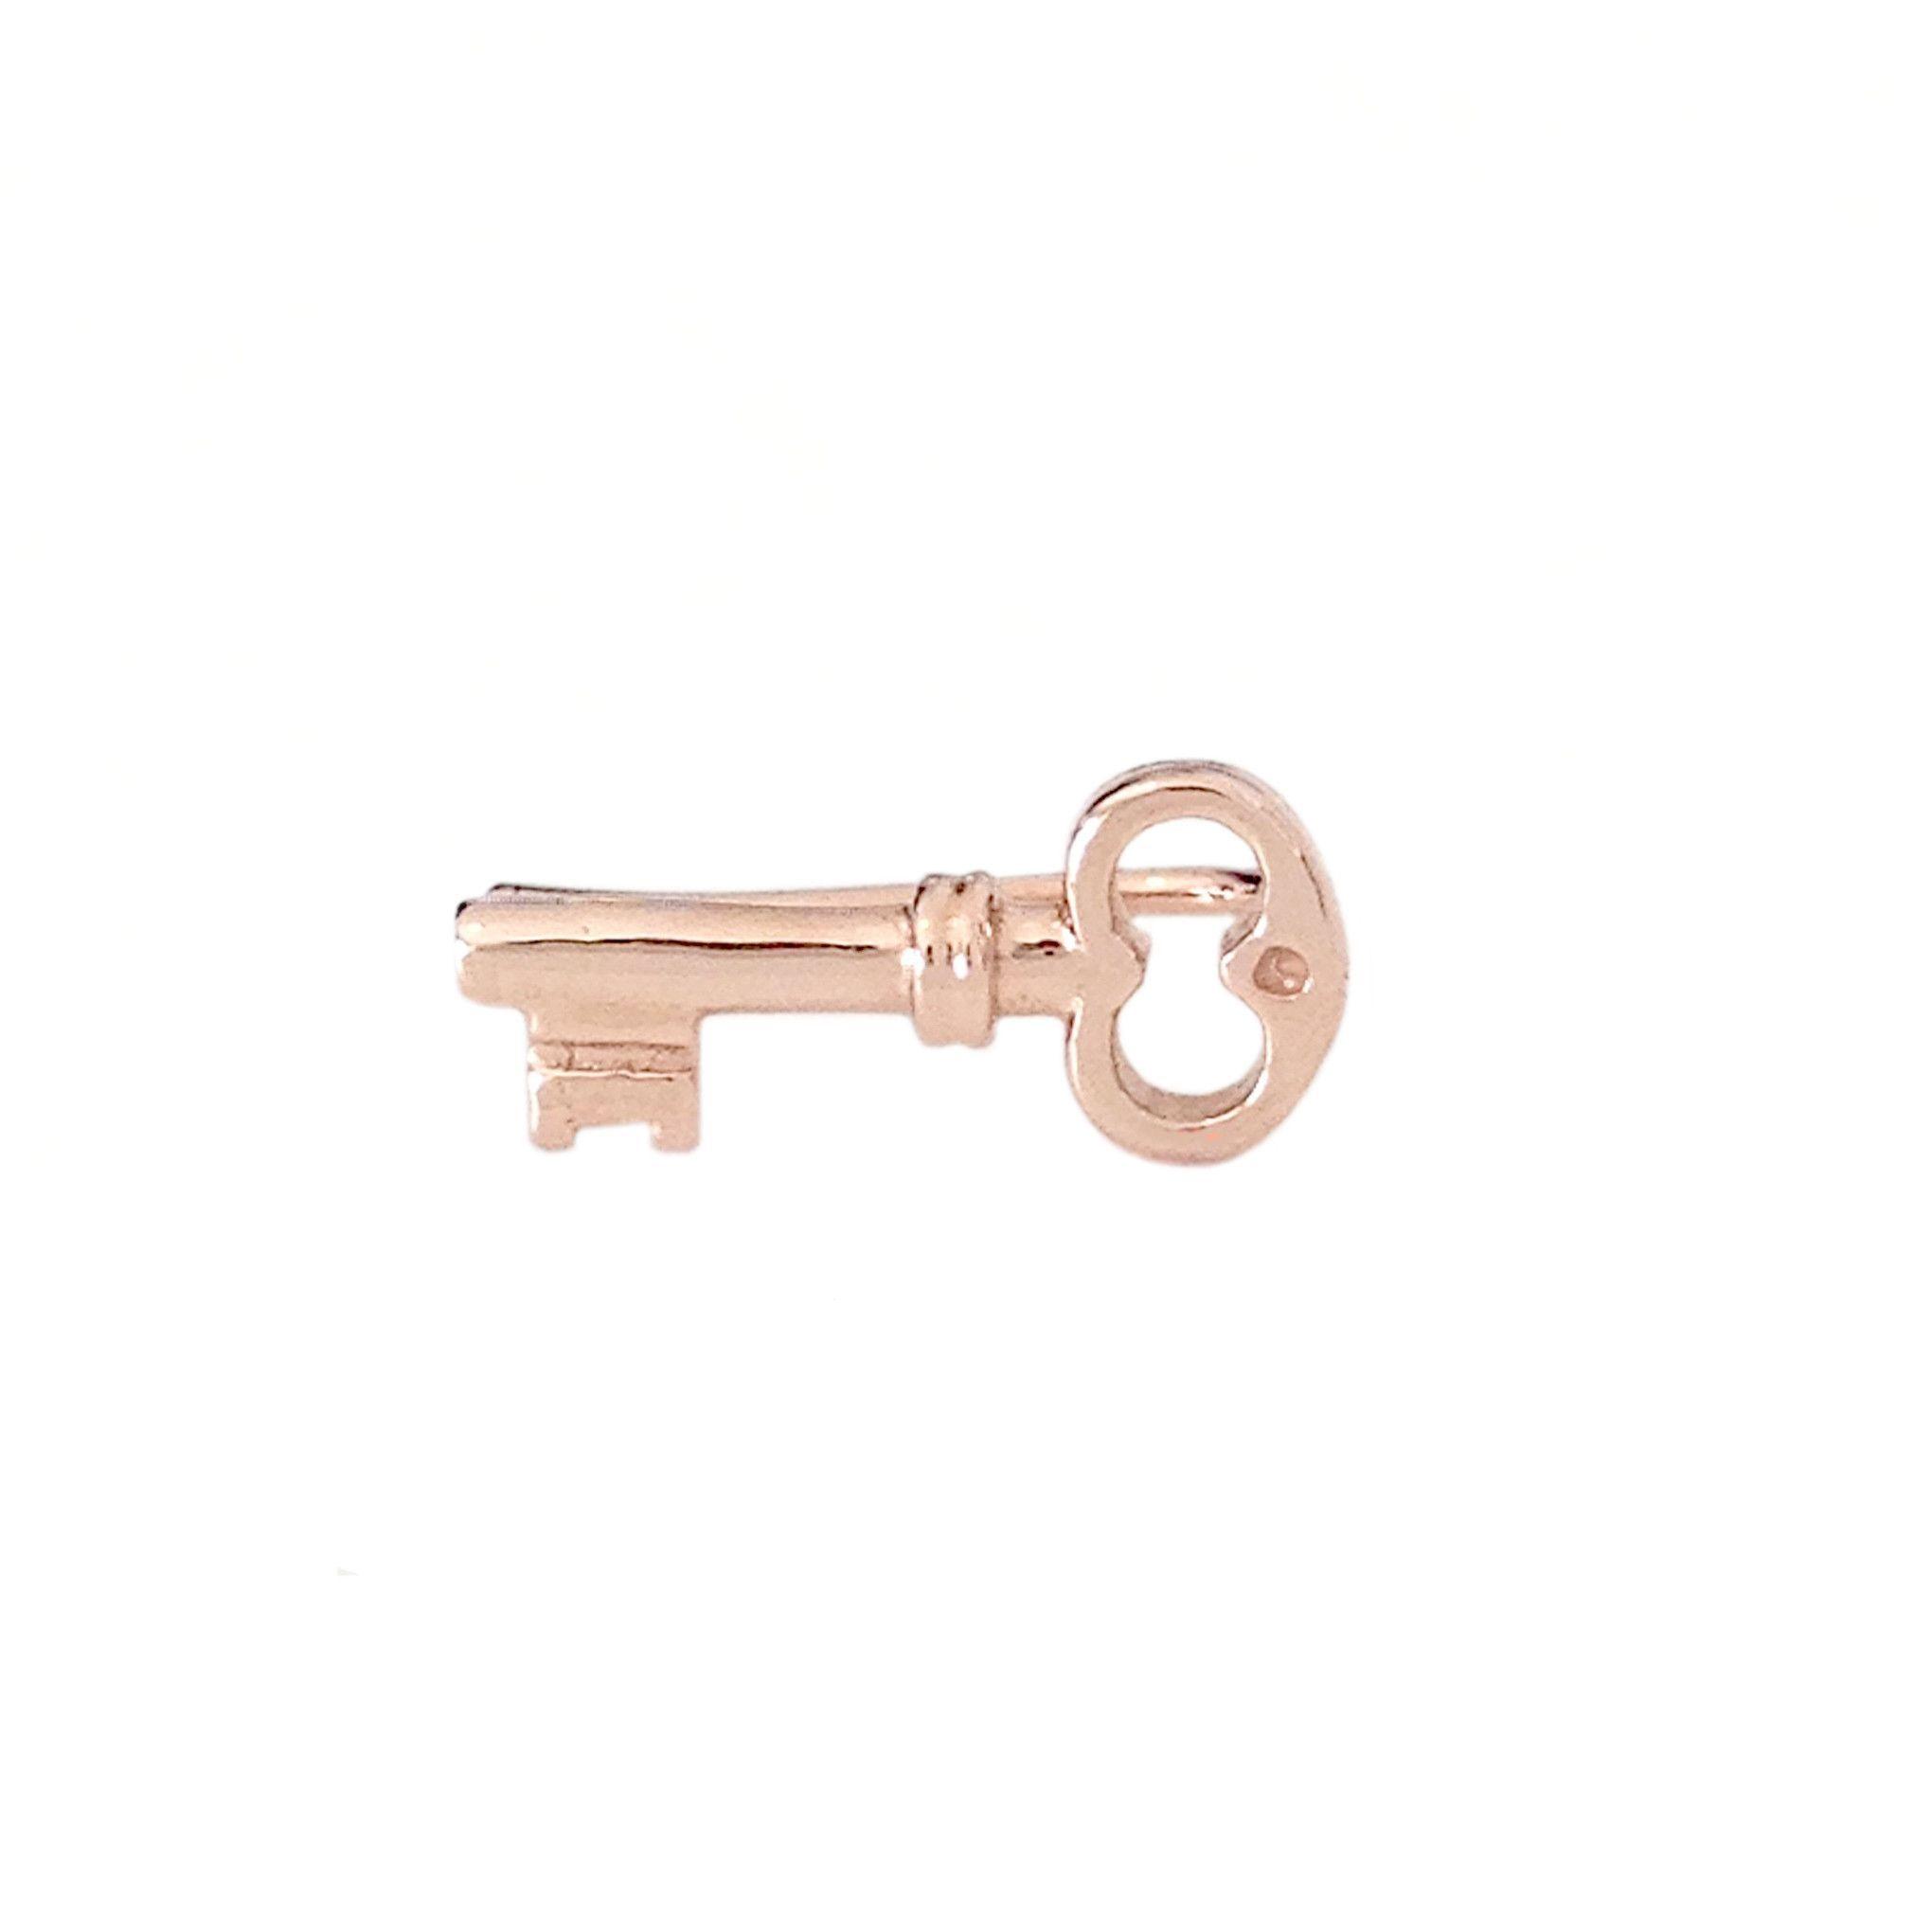 14K Gold XS Key Climber Earring